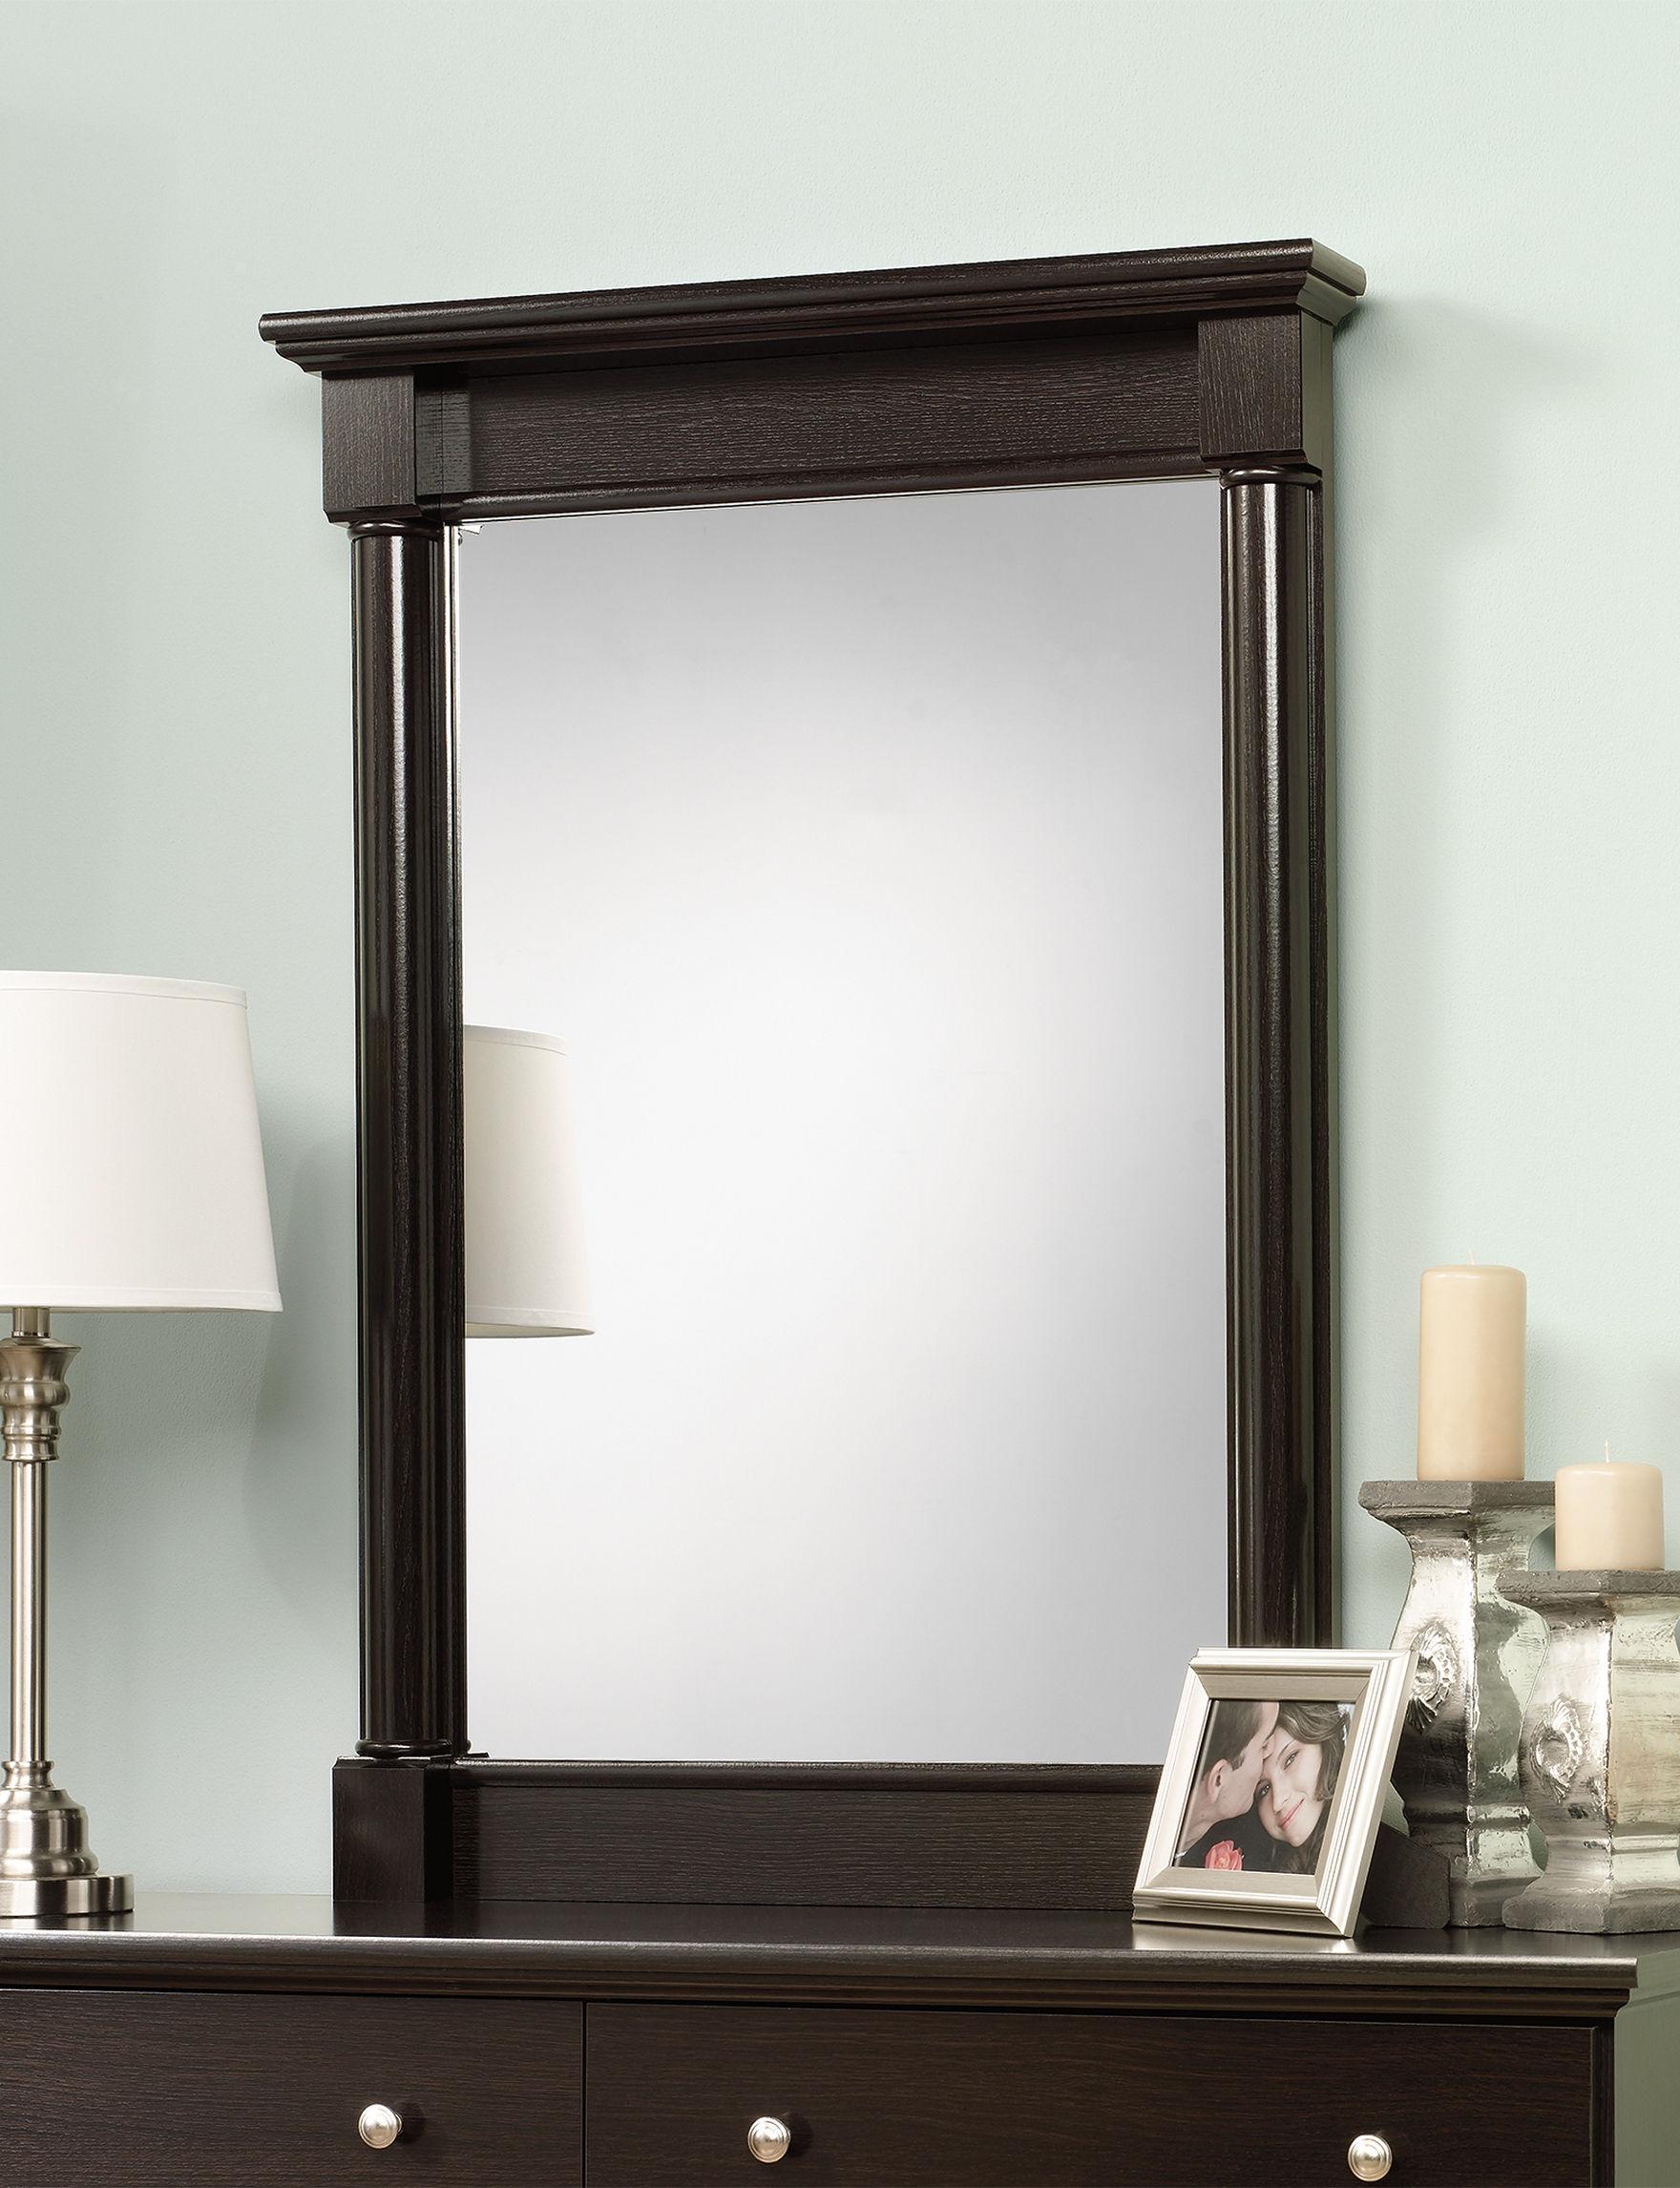 Sauder Espresso Mirrors Bedroom Furniture